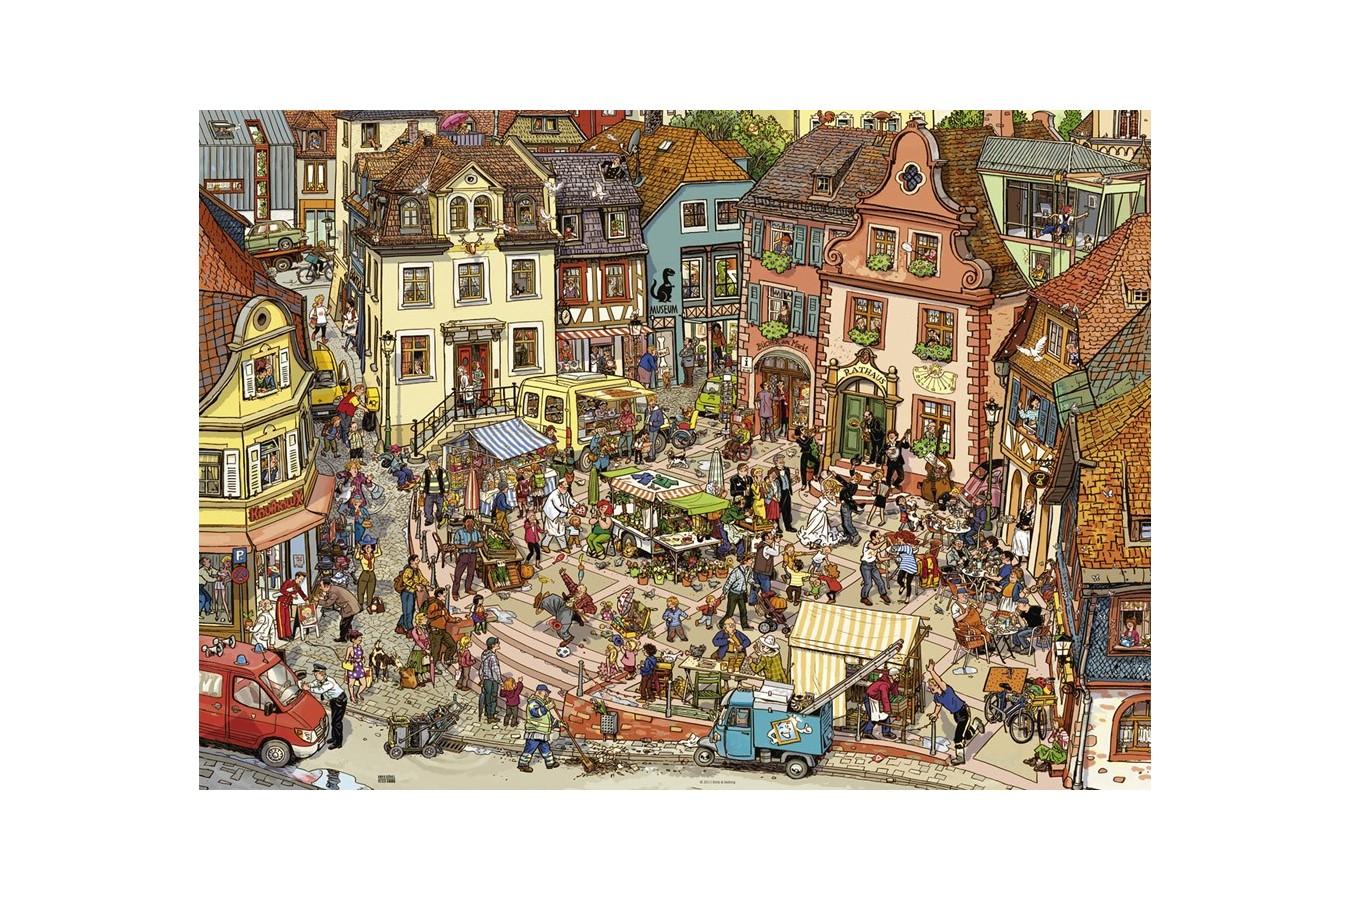 Puzzle Heye - Doro Gobel & Peter Knorr: Market Place, 1.000 piese (29884) imagine